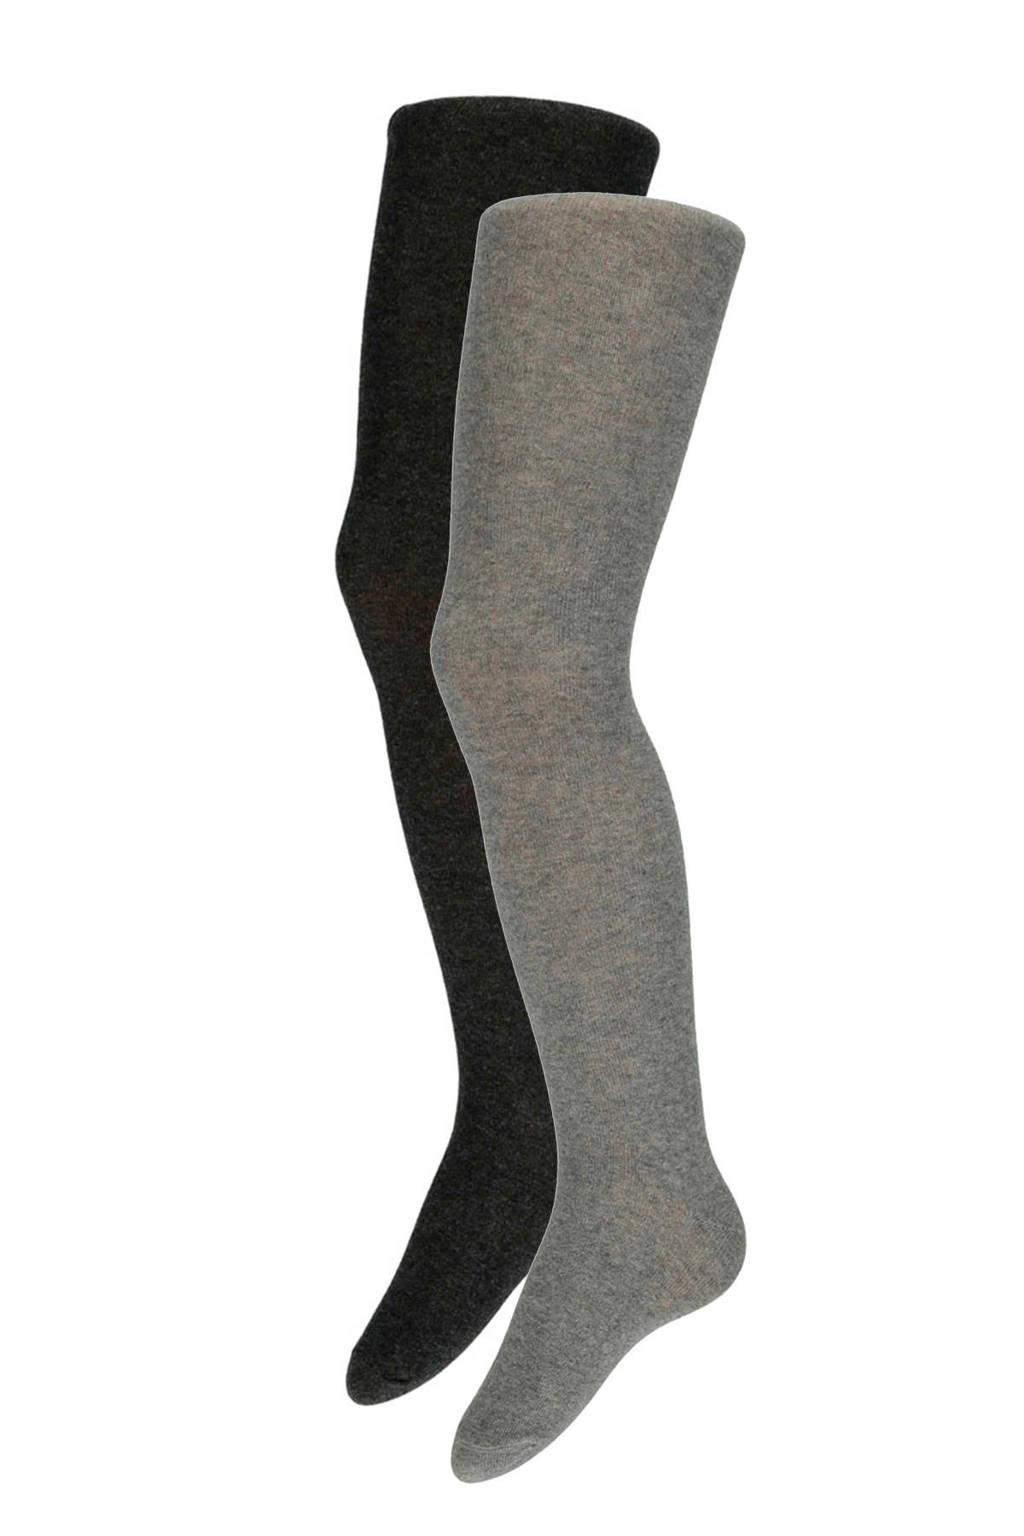 Apollo maillot ( 2 paar) grijs, Grijs/lichtgrijs